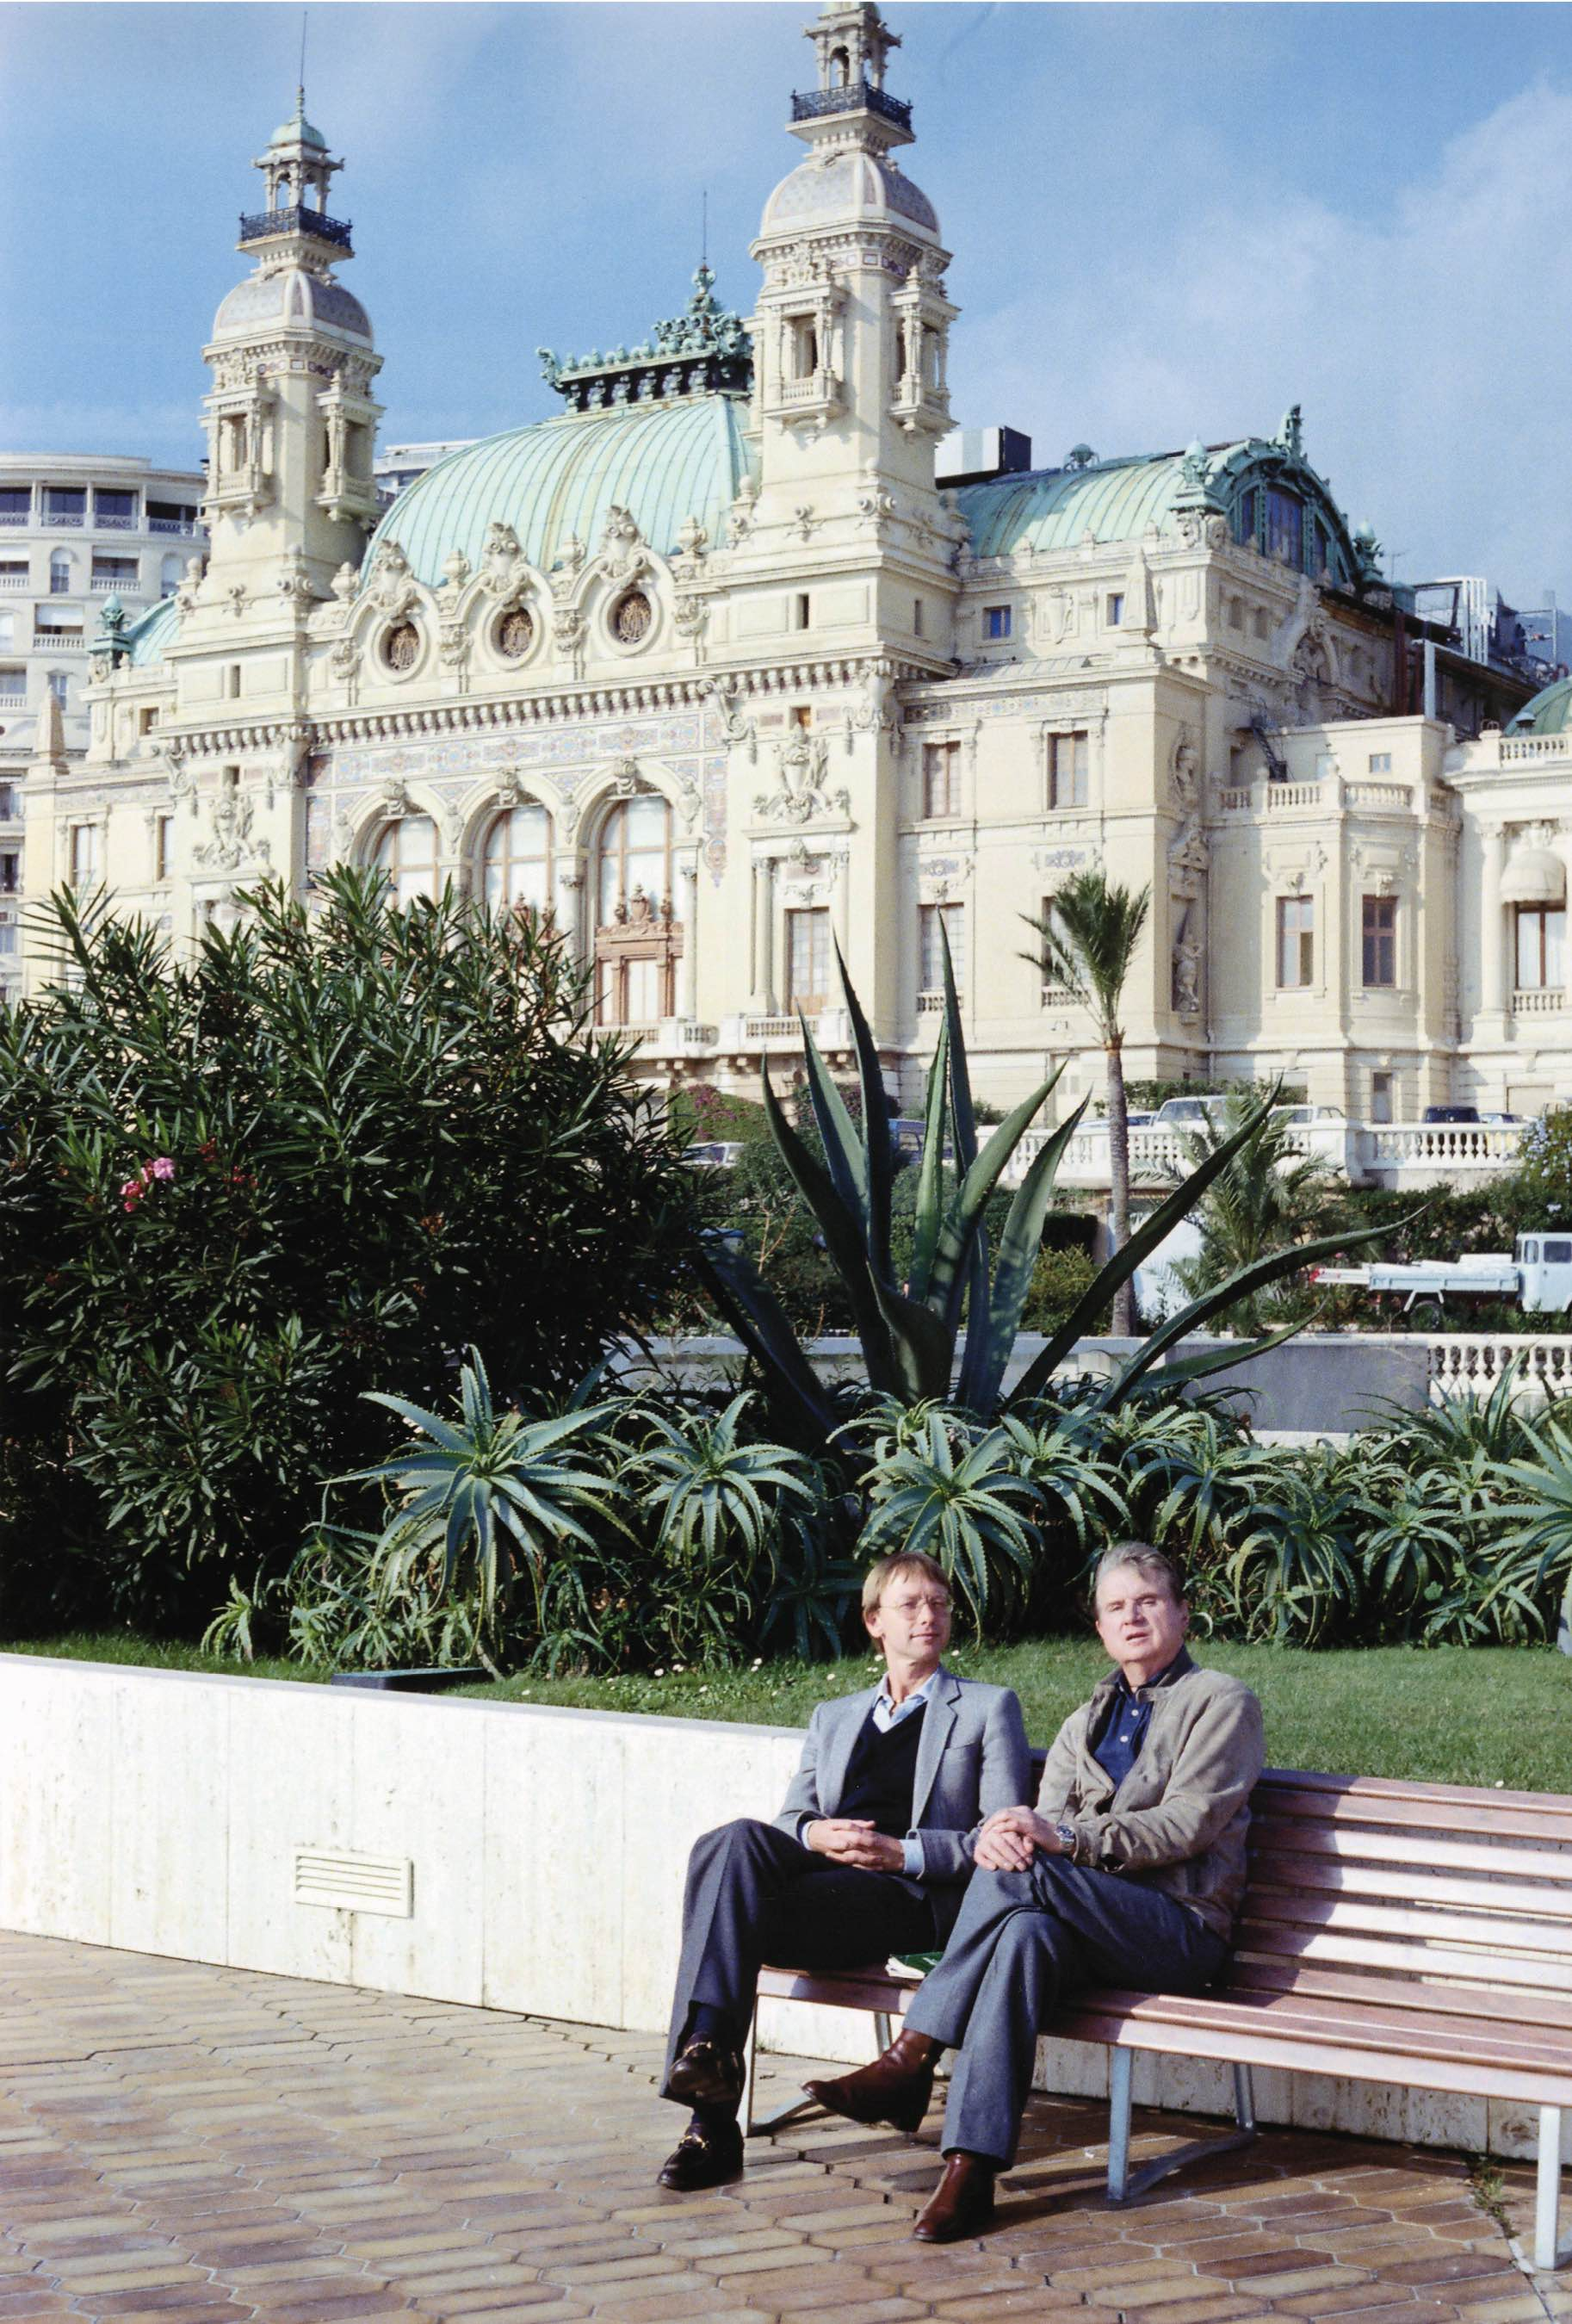 Francis Bacon a Monte-Carlo, 1981 - (c) Eddy Batache - courtesy Francis Bacon MB Art Foundation - MB Art Collection